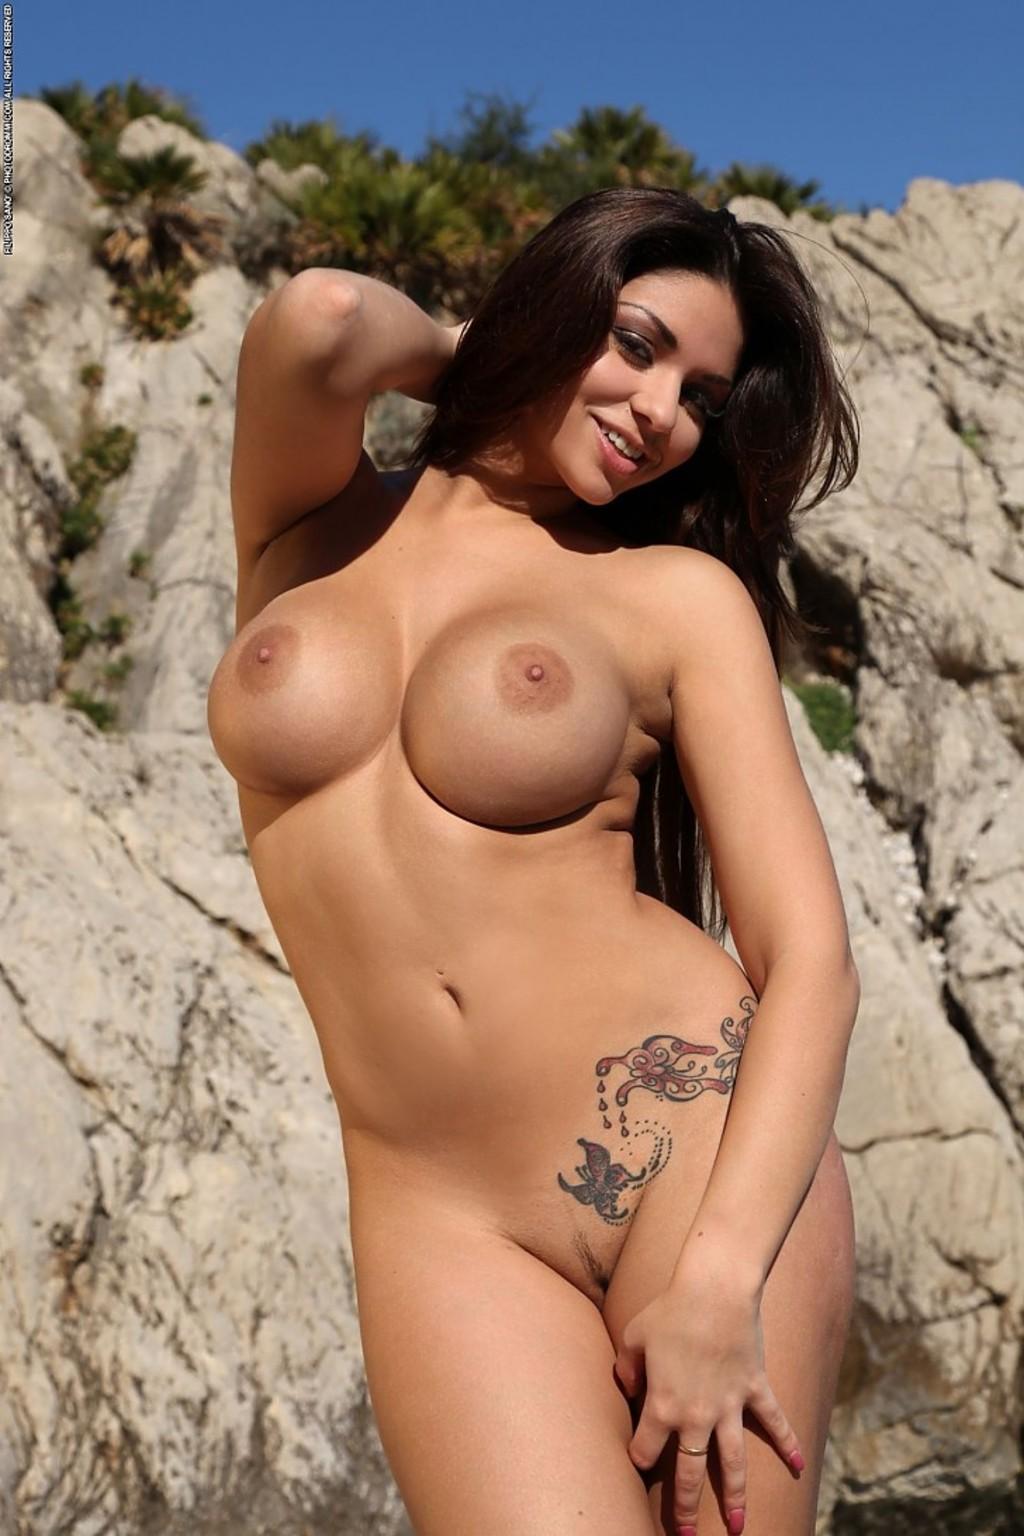 Female nude bikini babes 14